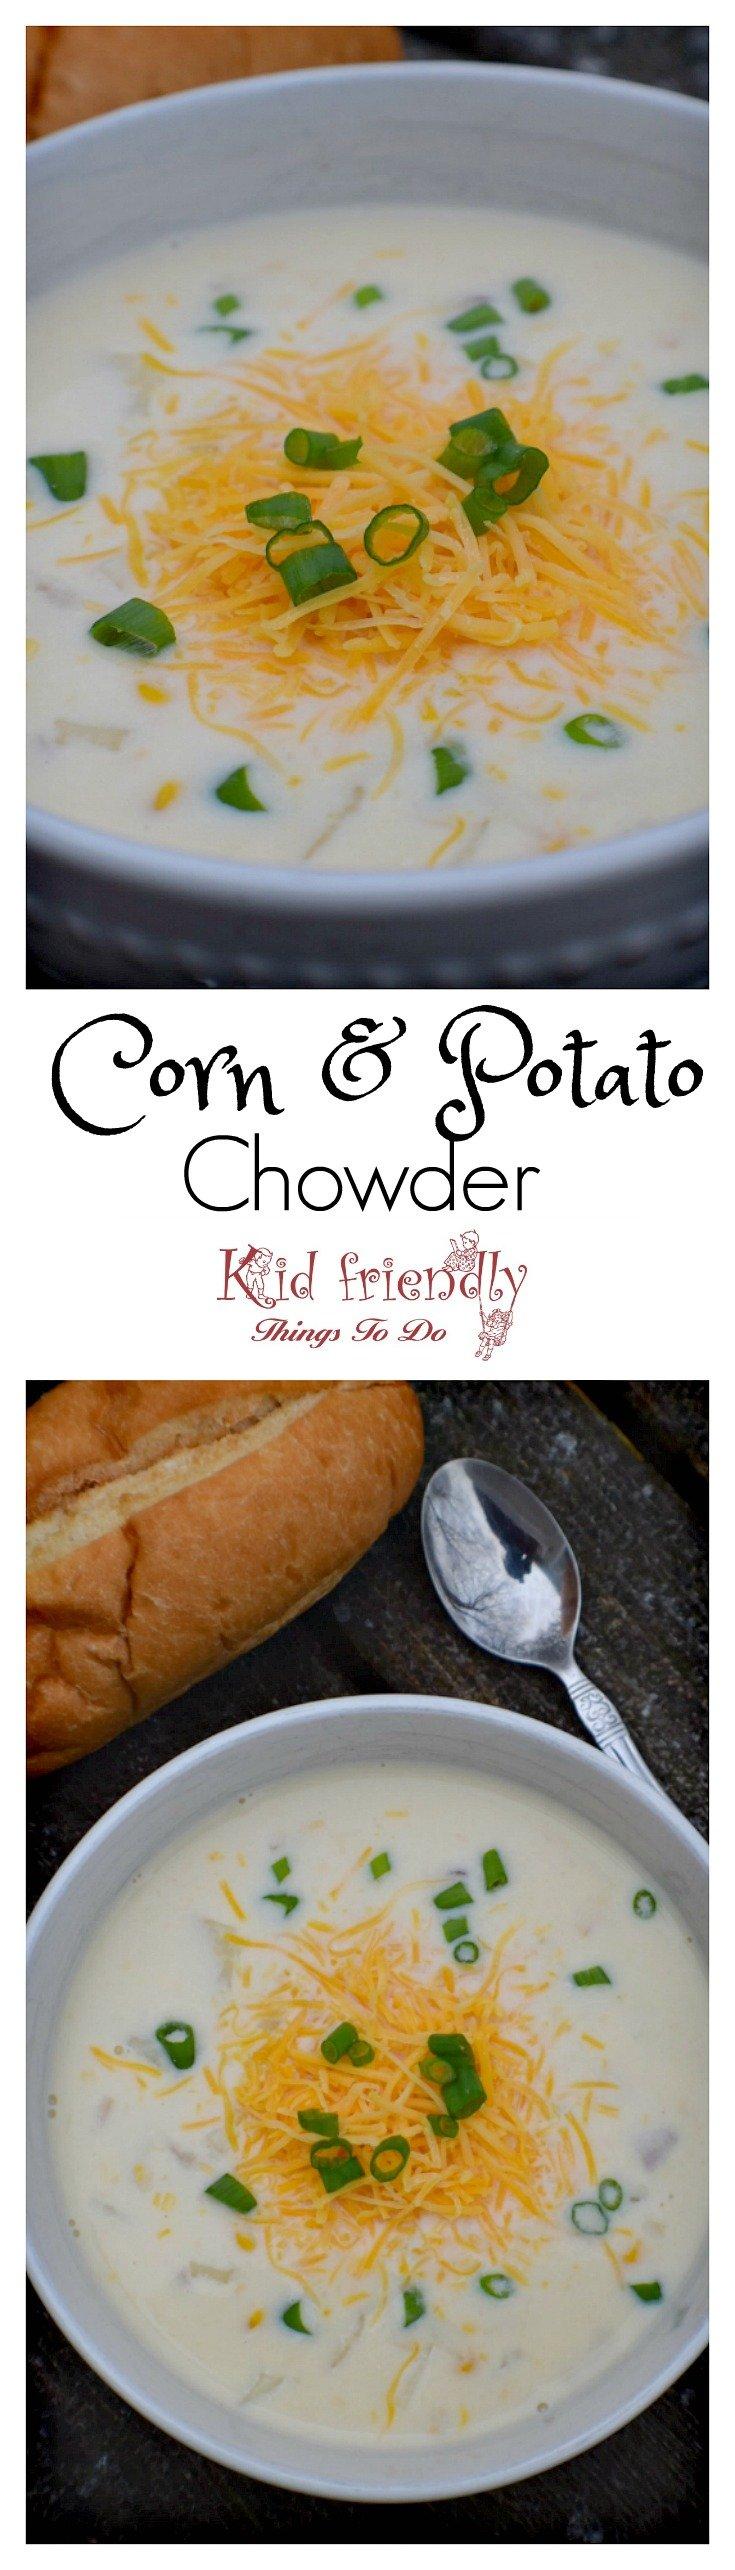 Quick and Easy Corn and Potato Chowder Recipe - www.kidfriendllythingstodo.com